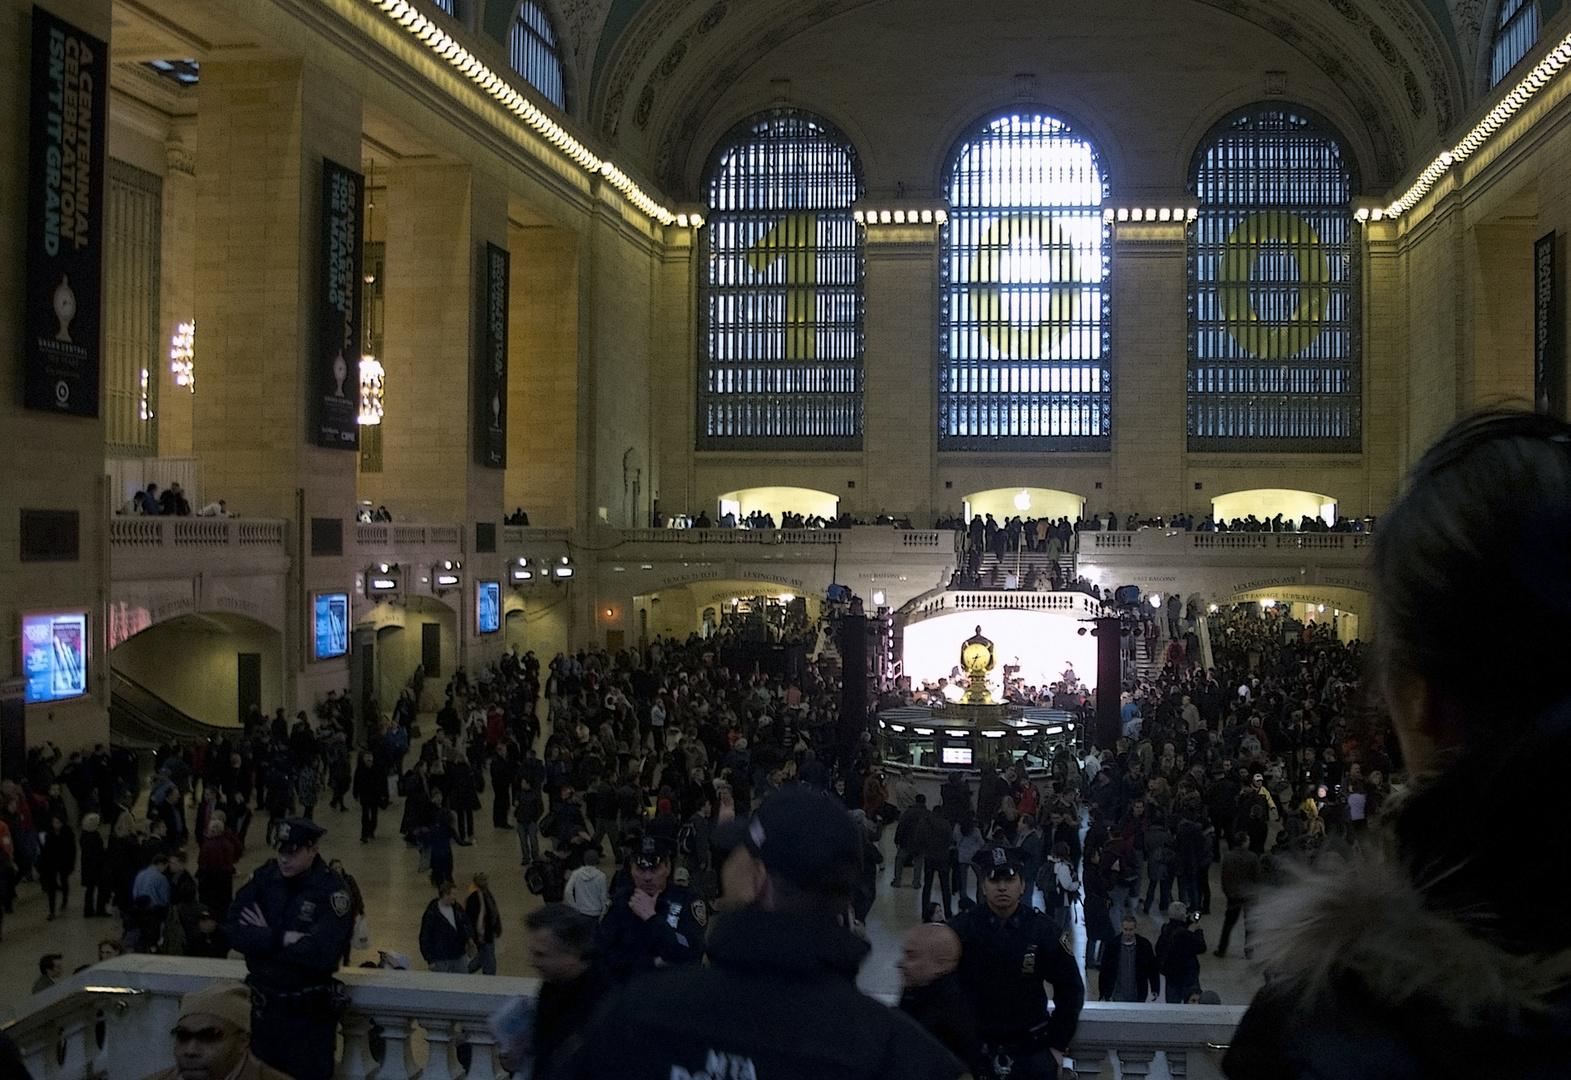 100 Jahre Grand Central Terminal